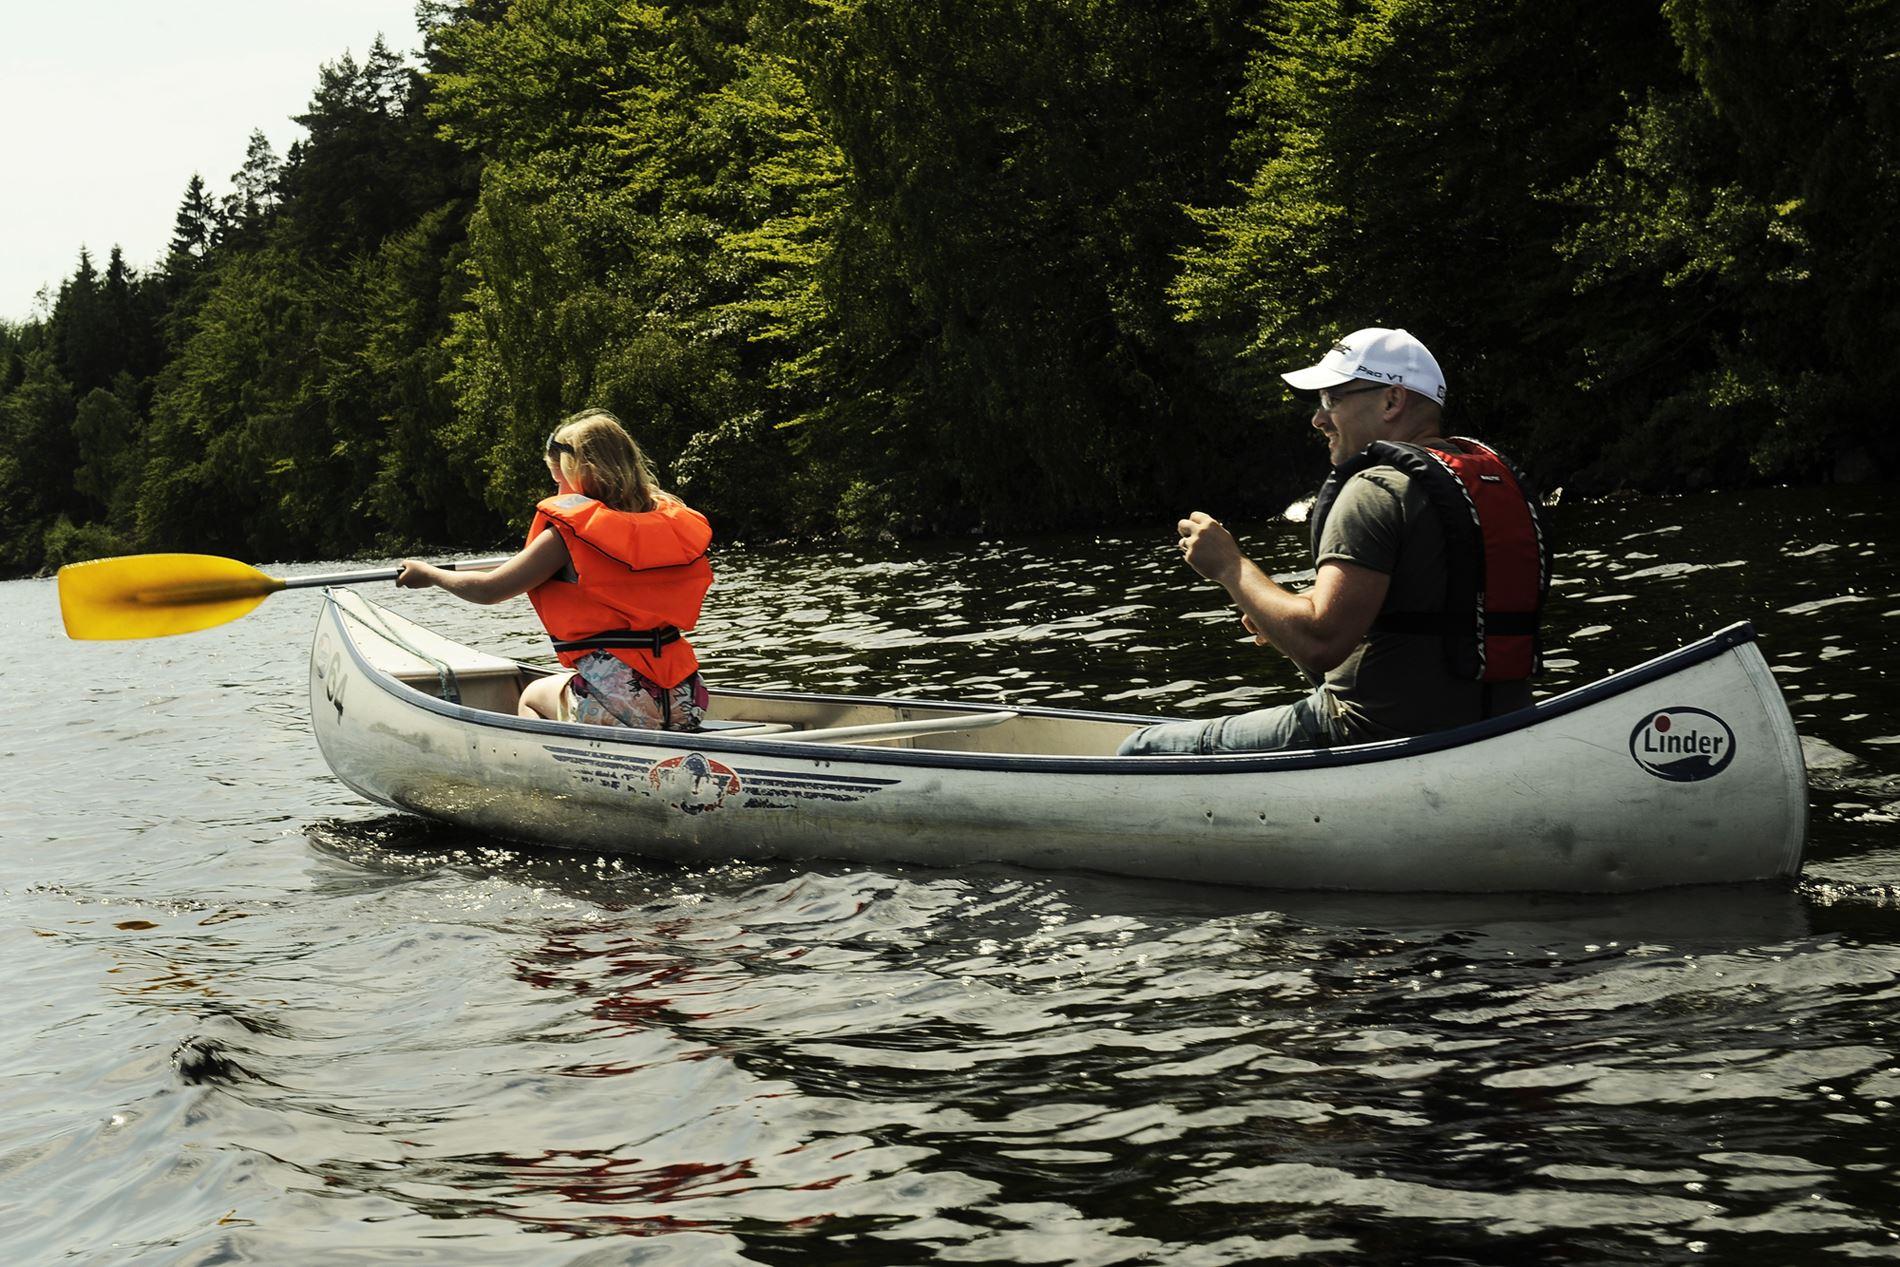 Fotograf: Precious People, Paddla med Immelns kanotcenter